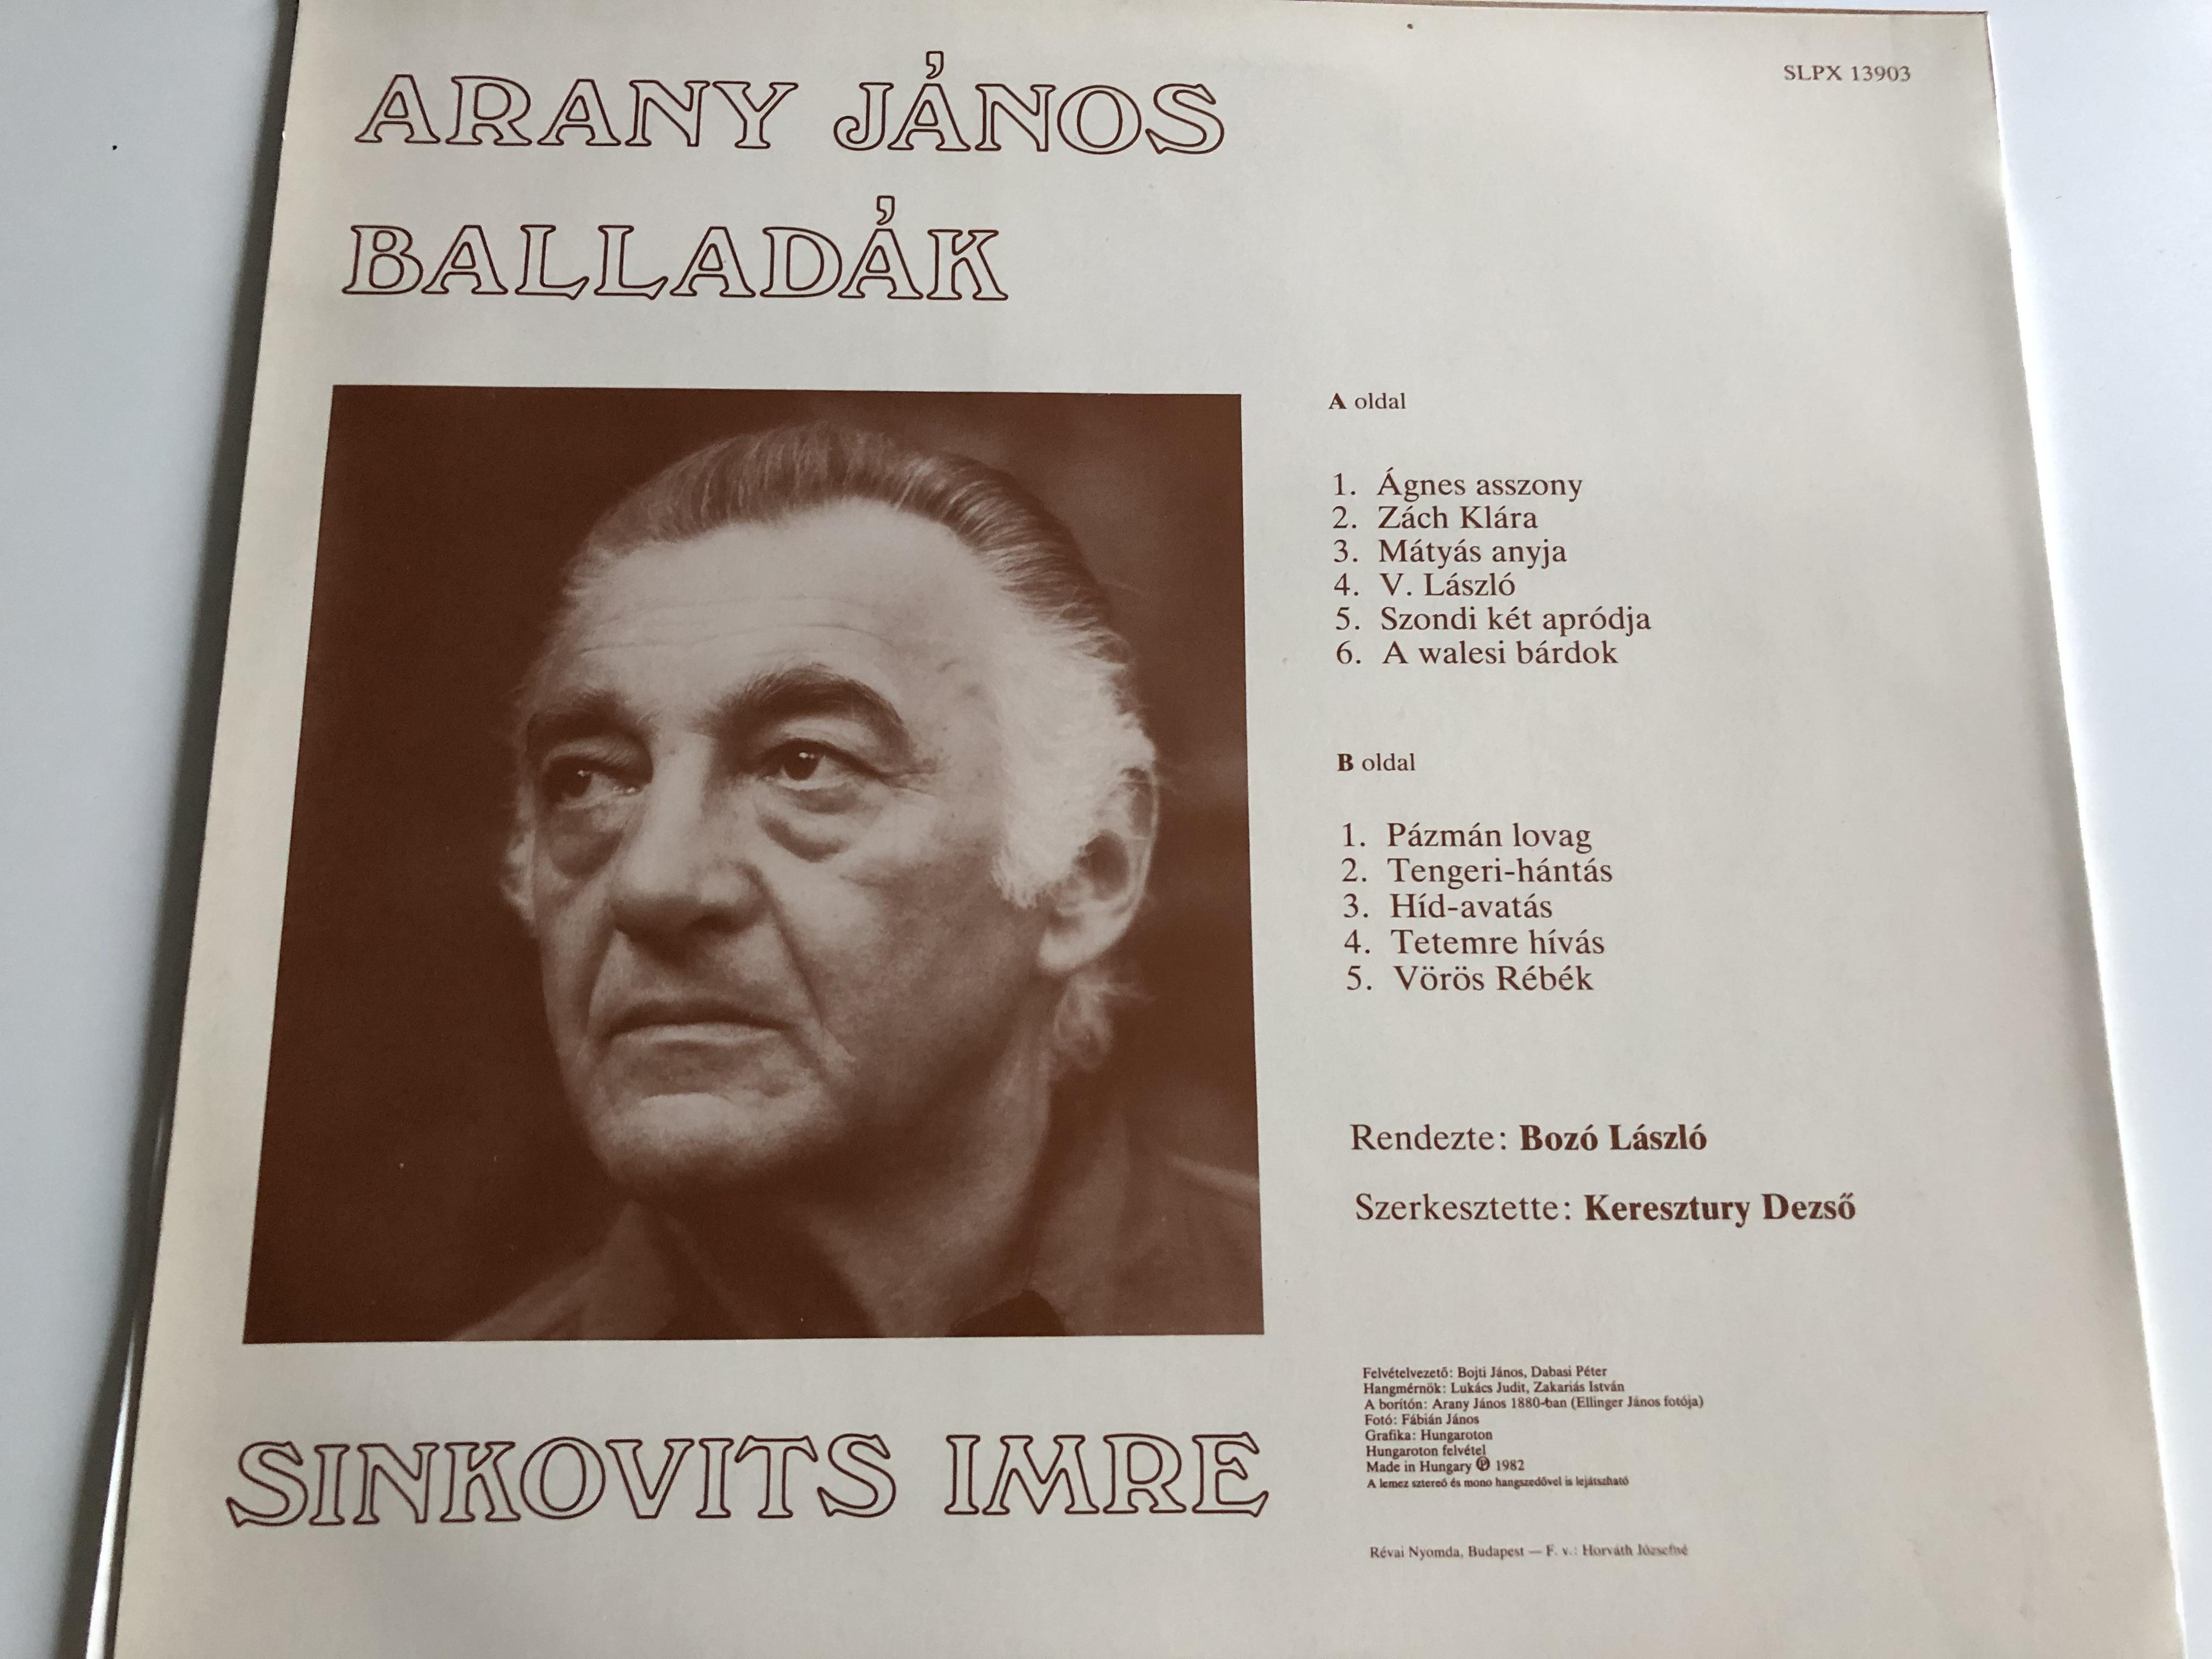 arany-j-nos-ballad-k-sinkovits-imre-hungaroton-lp-stereo-slpx-13903-3-.jpg